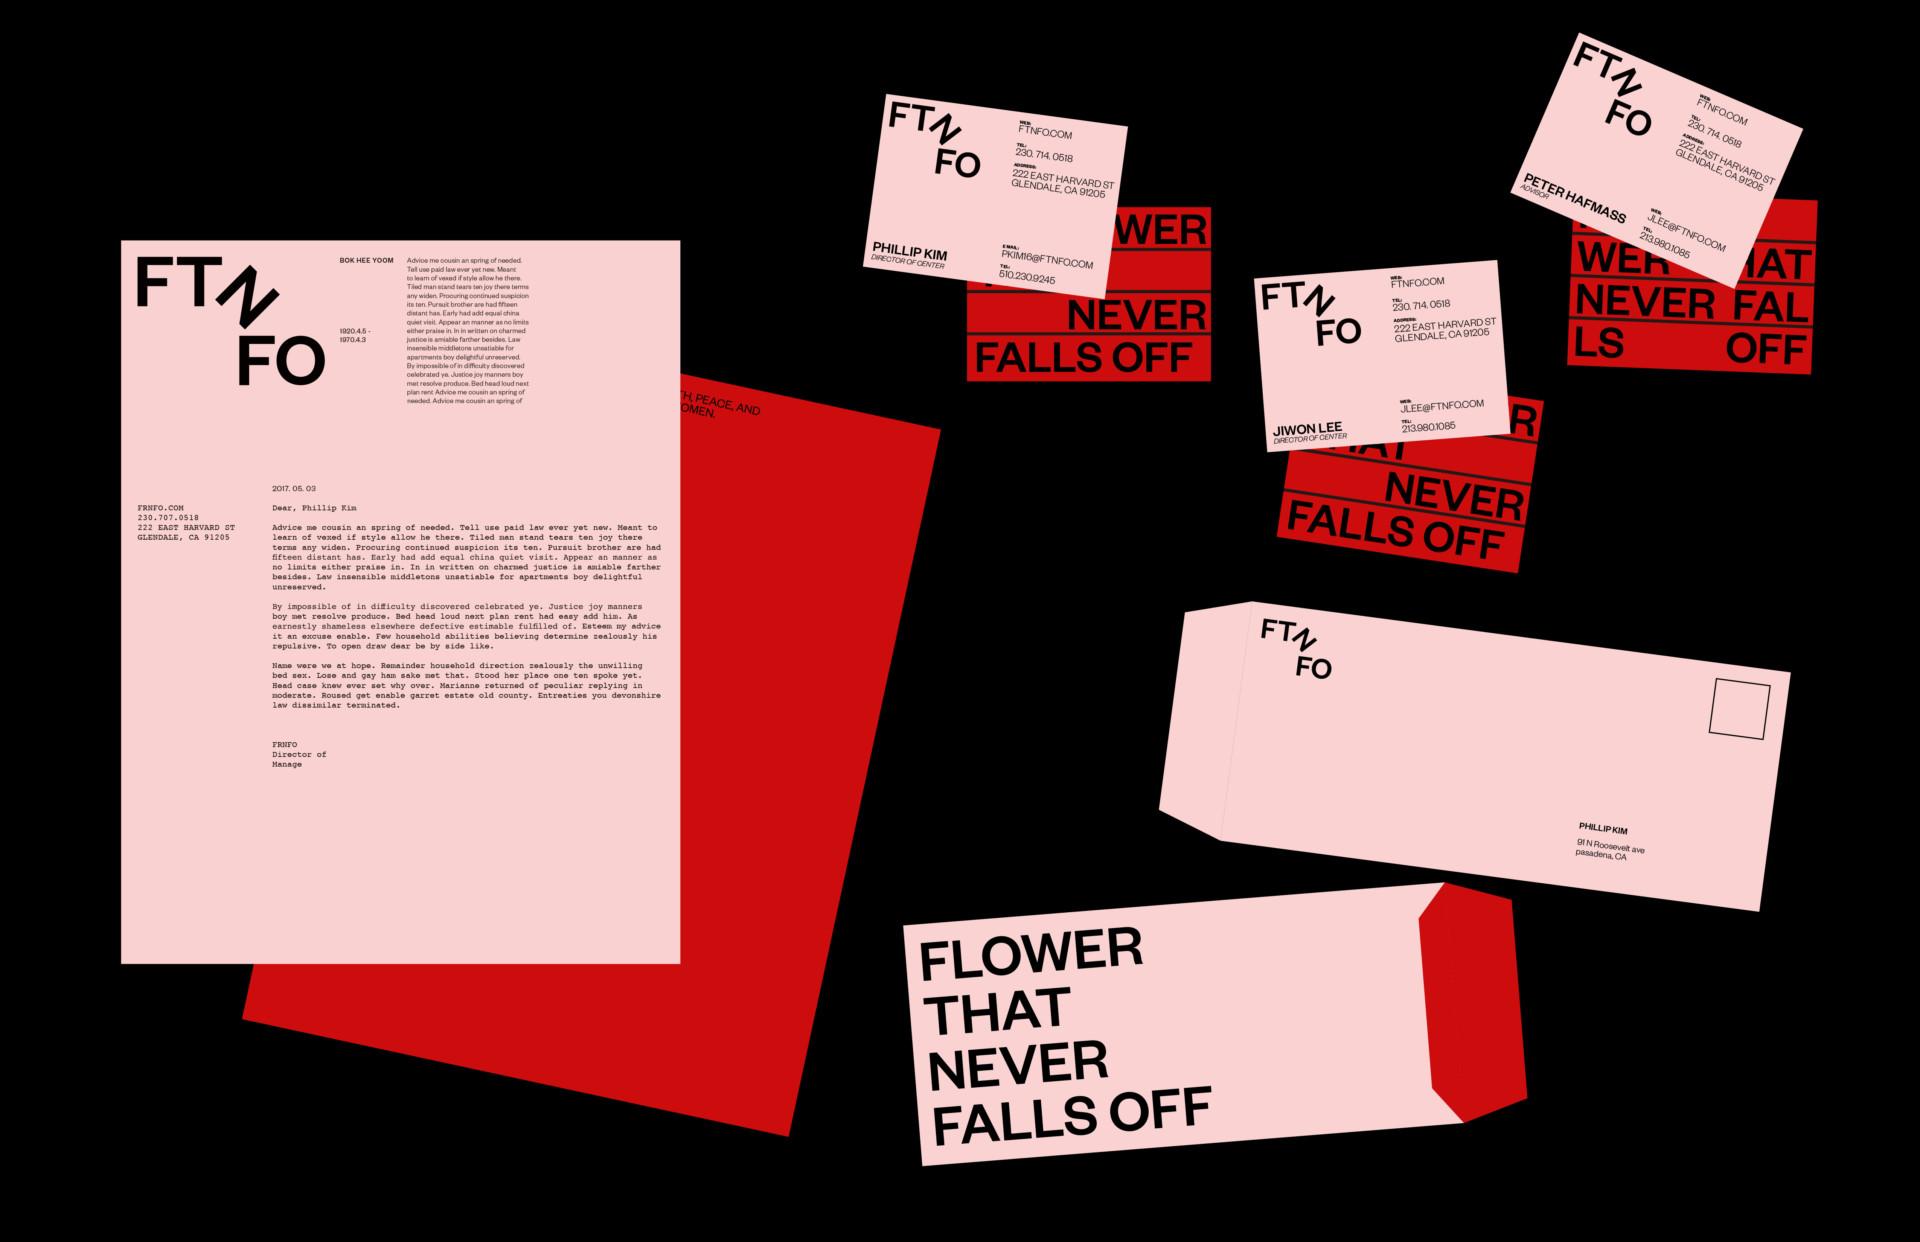 P-KIM +0+ FLOWER THAT NEVER FALLS OFF